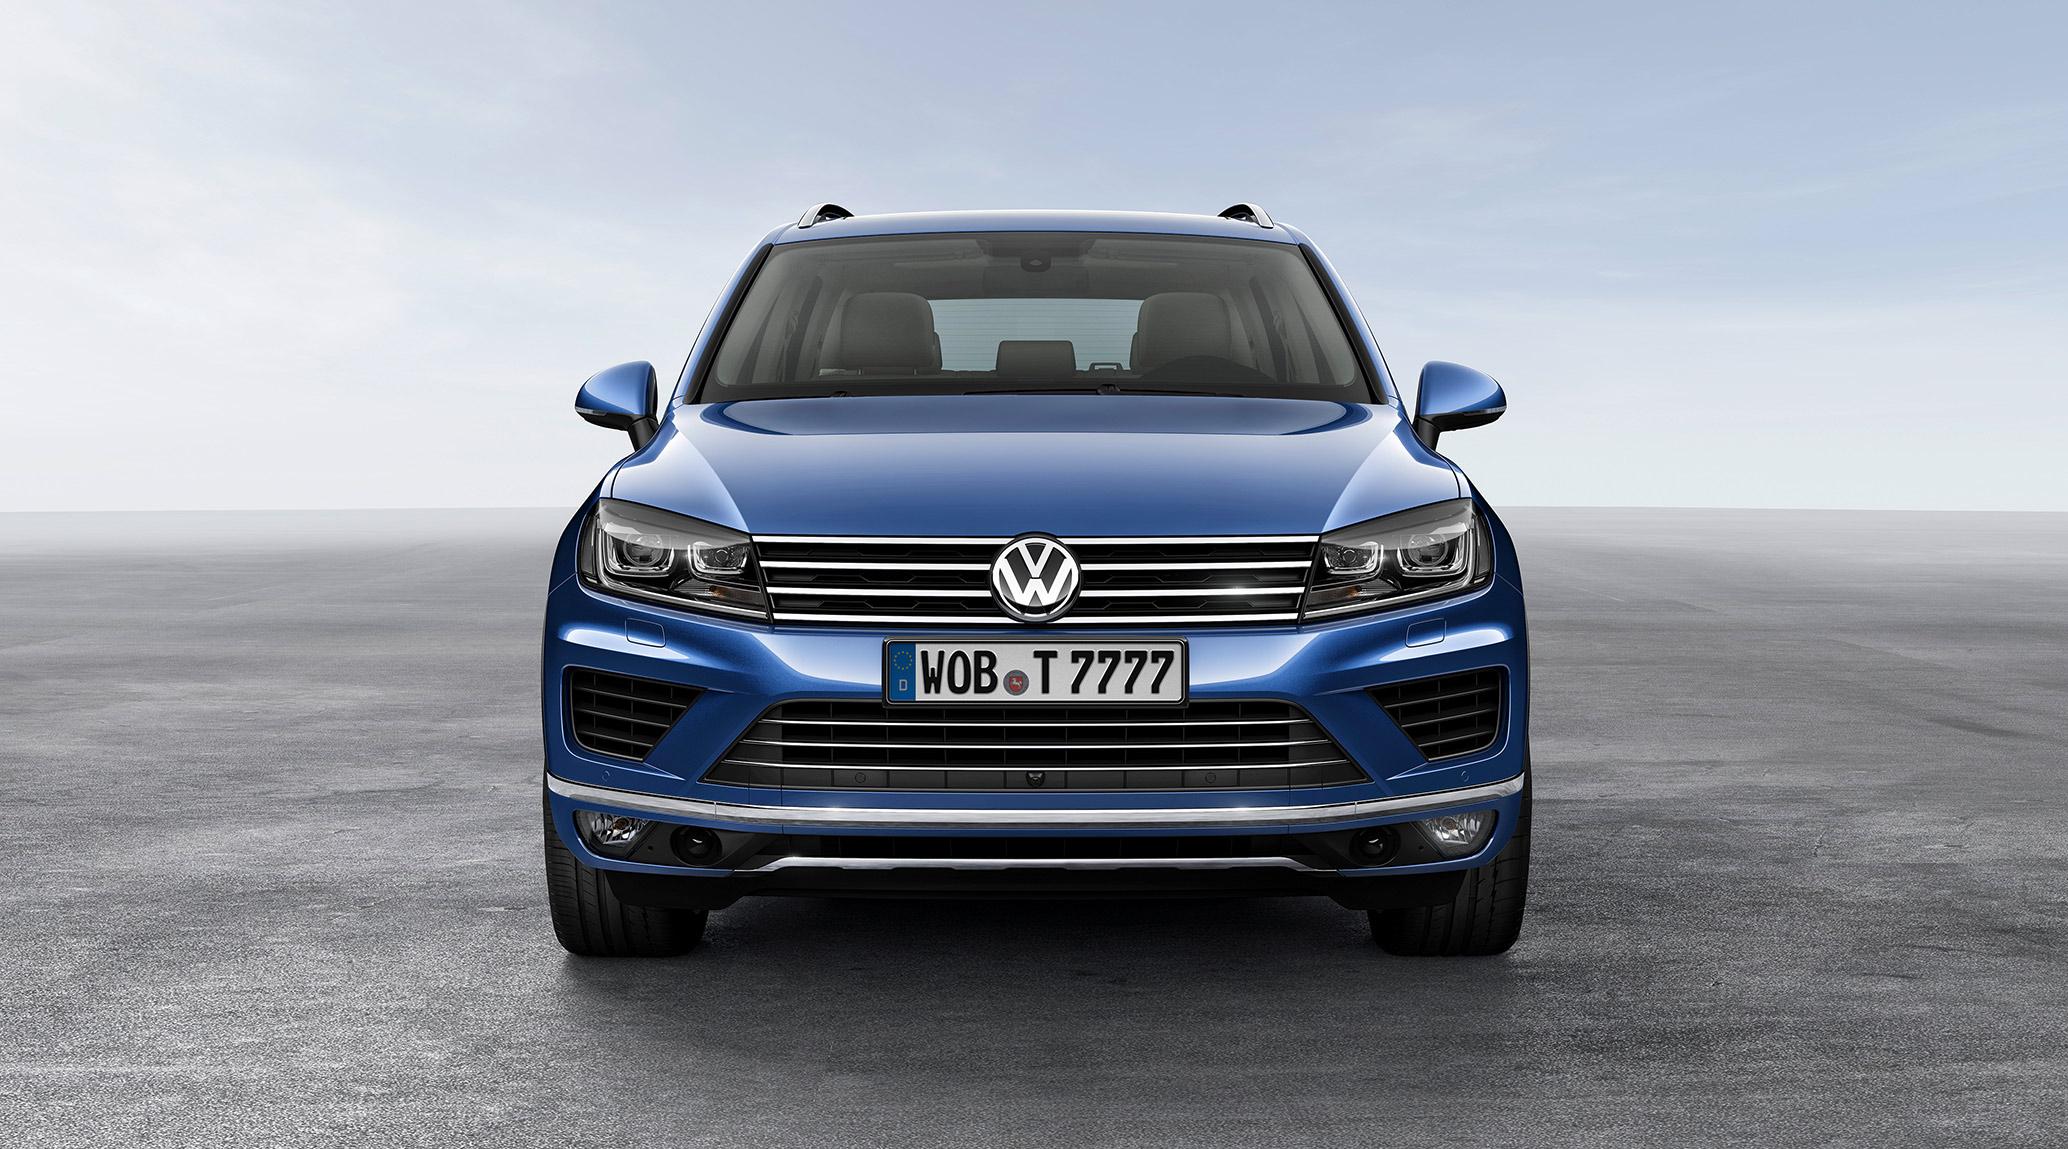 volkswagen-toureg-facelift-5